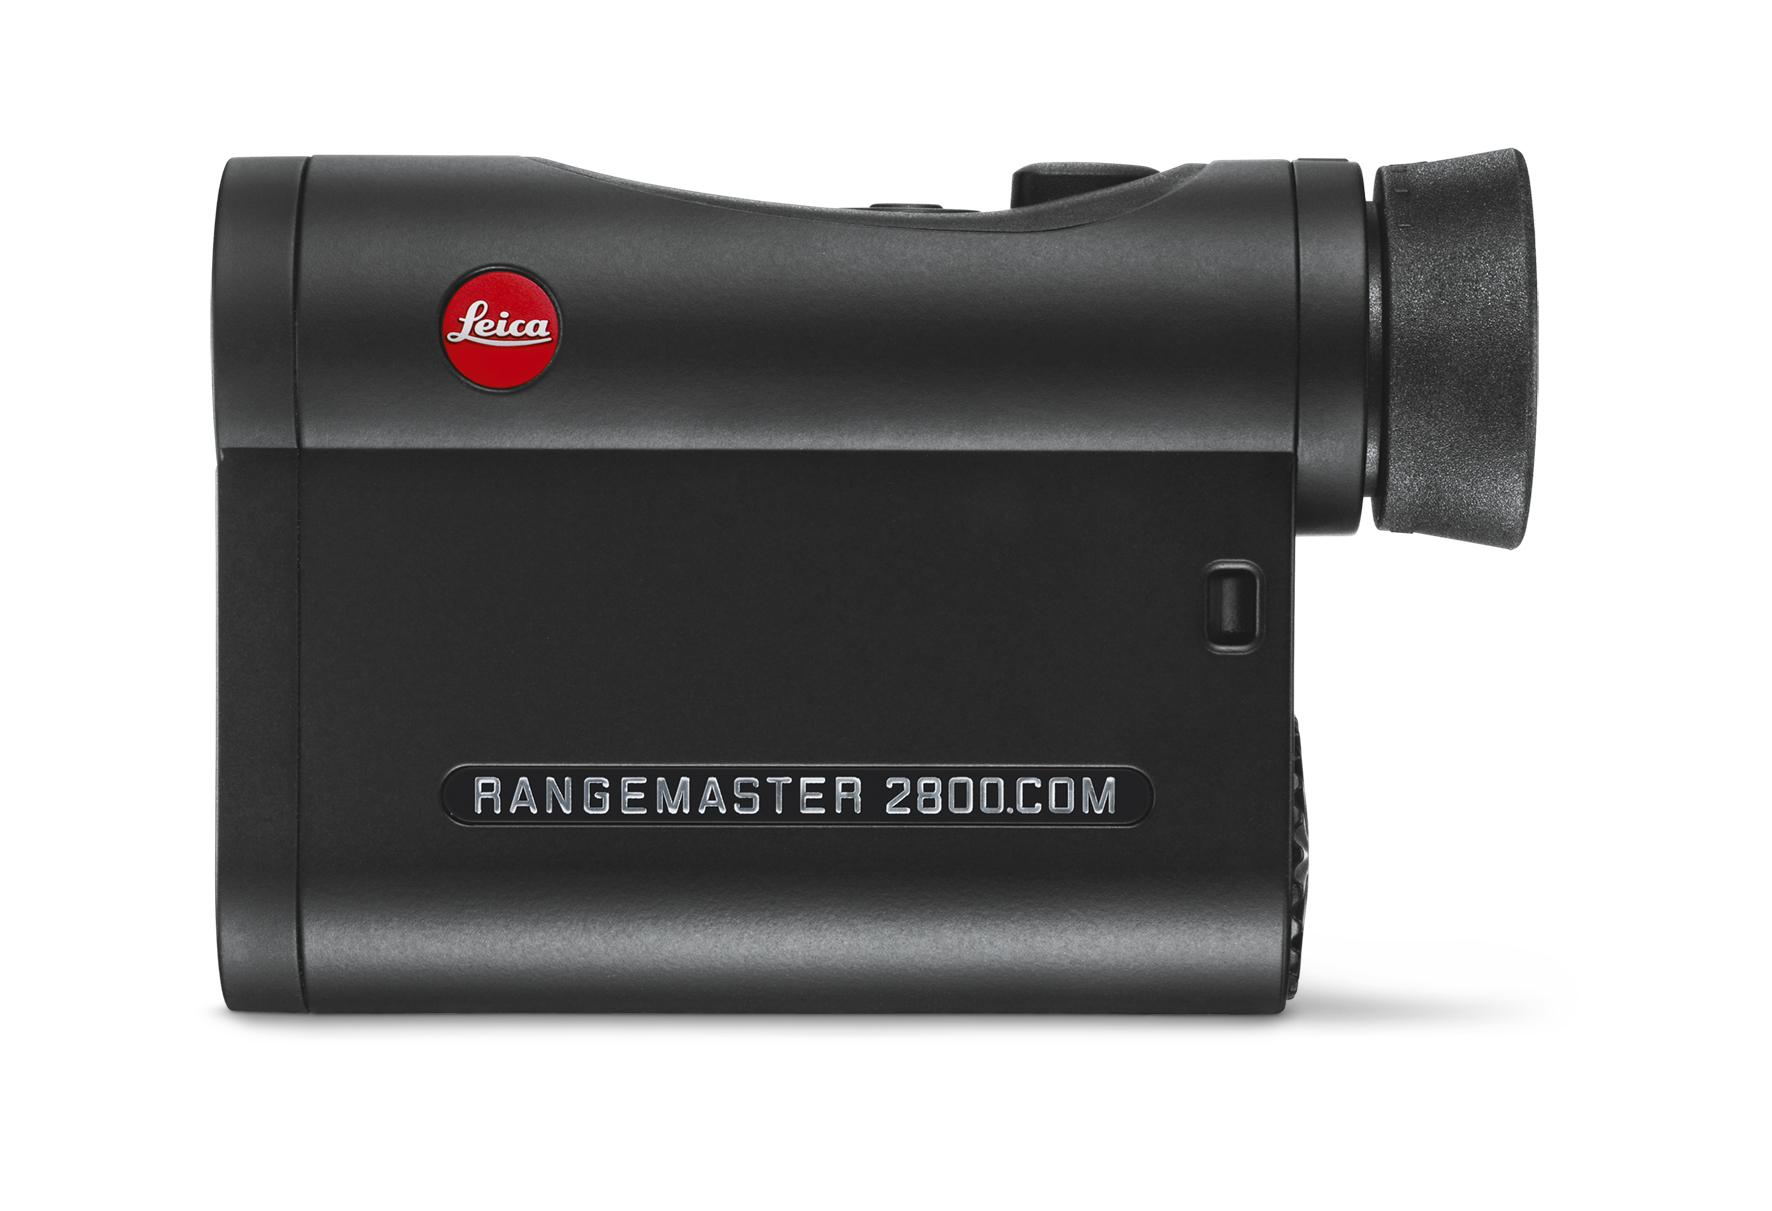 Leica rangemaster crf leica galerie frankfurt